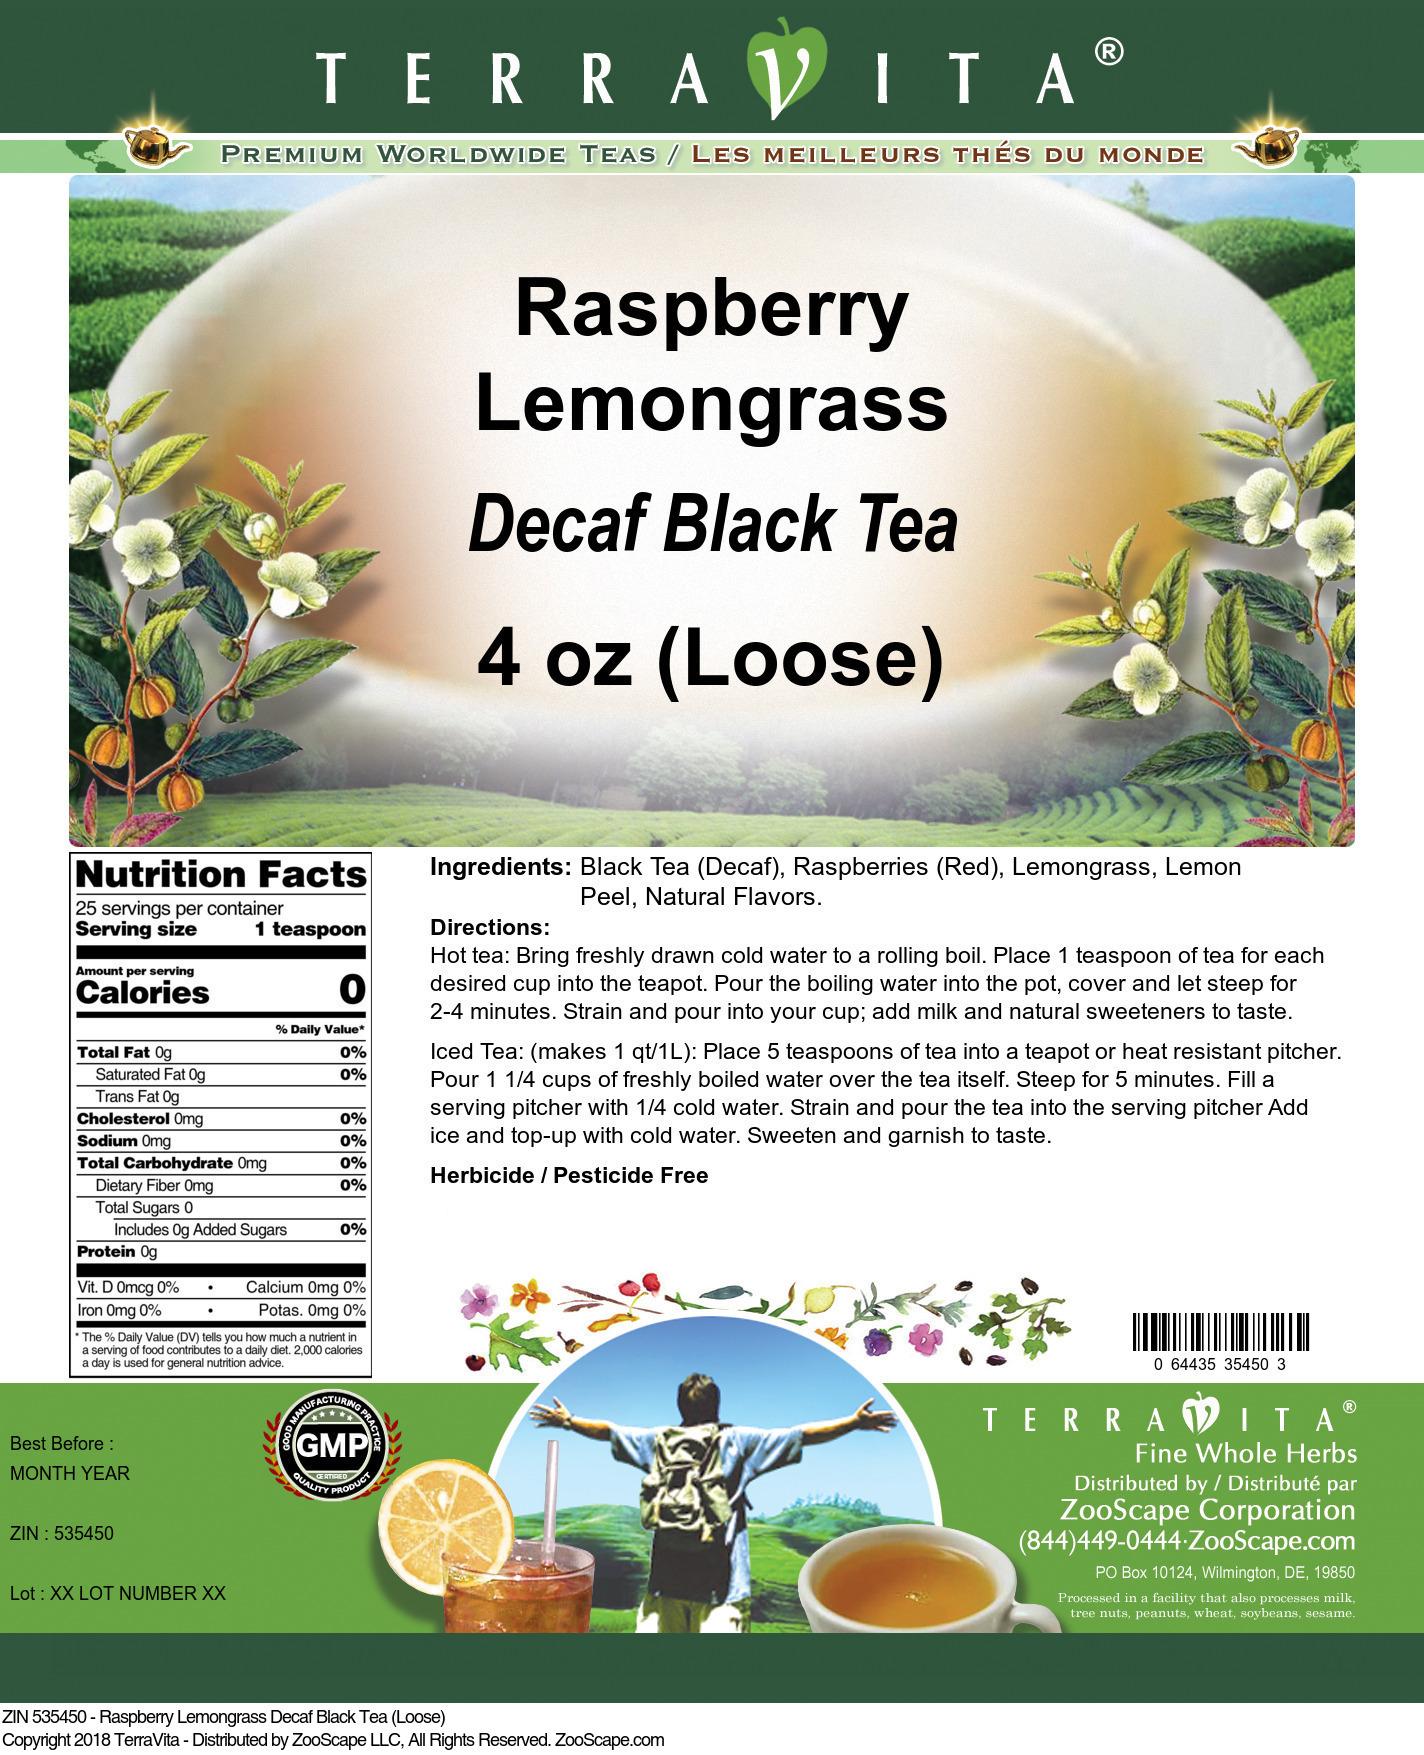 Raspberry Lemongrass Decaf Black Tea (Loose)